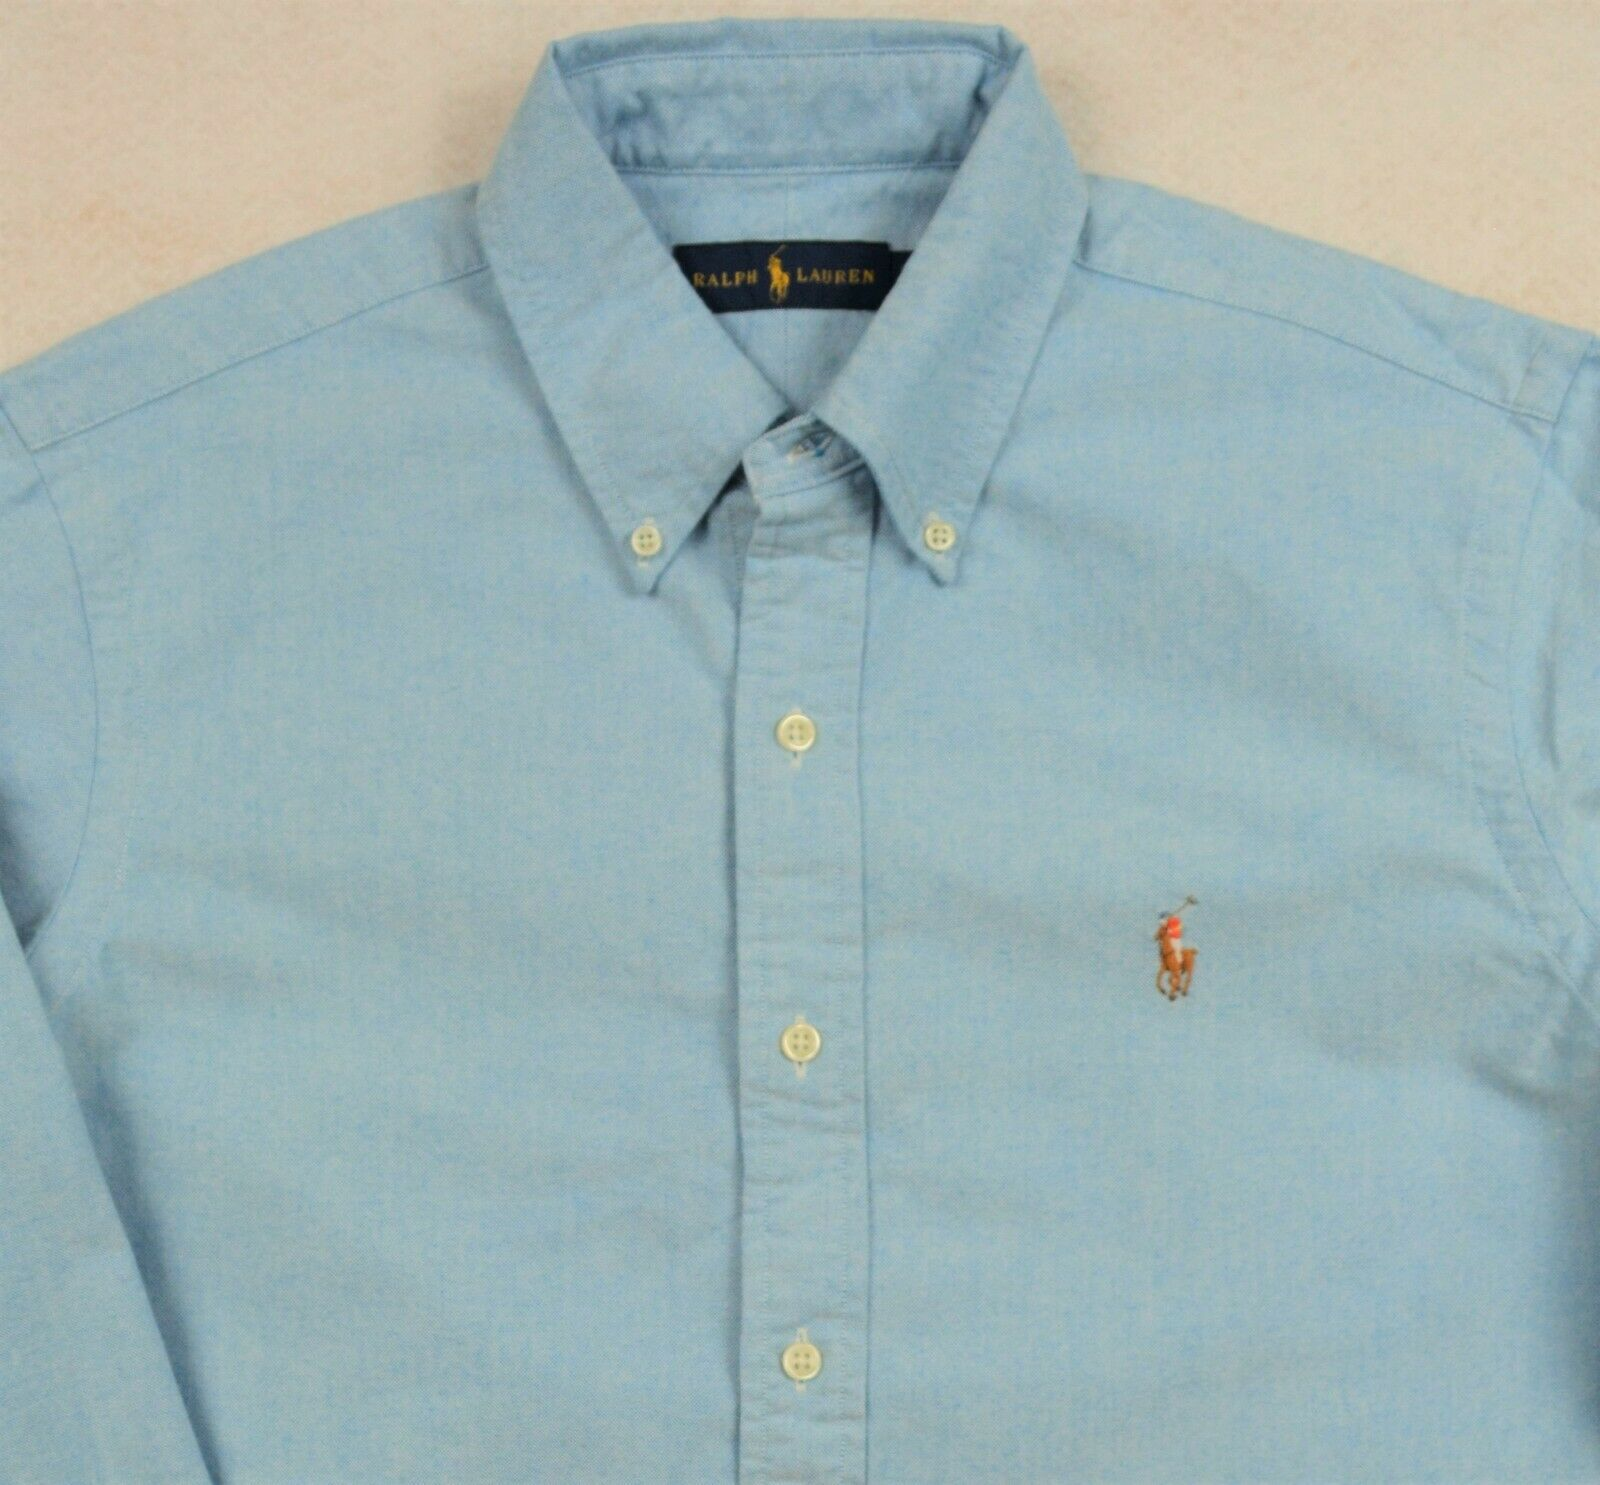 Ralph Lauren Shirt Oxford Long Sleeves Button-Front Optic bluee M & L NWT